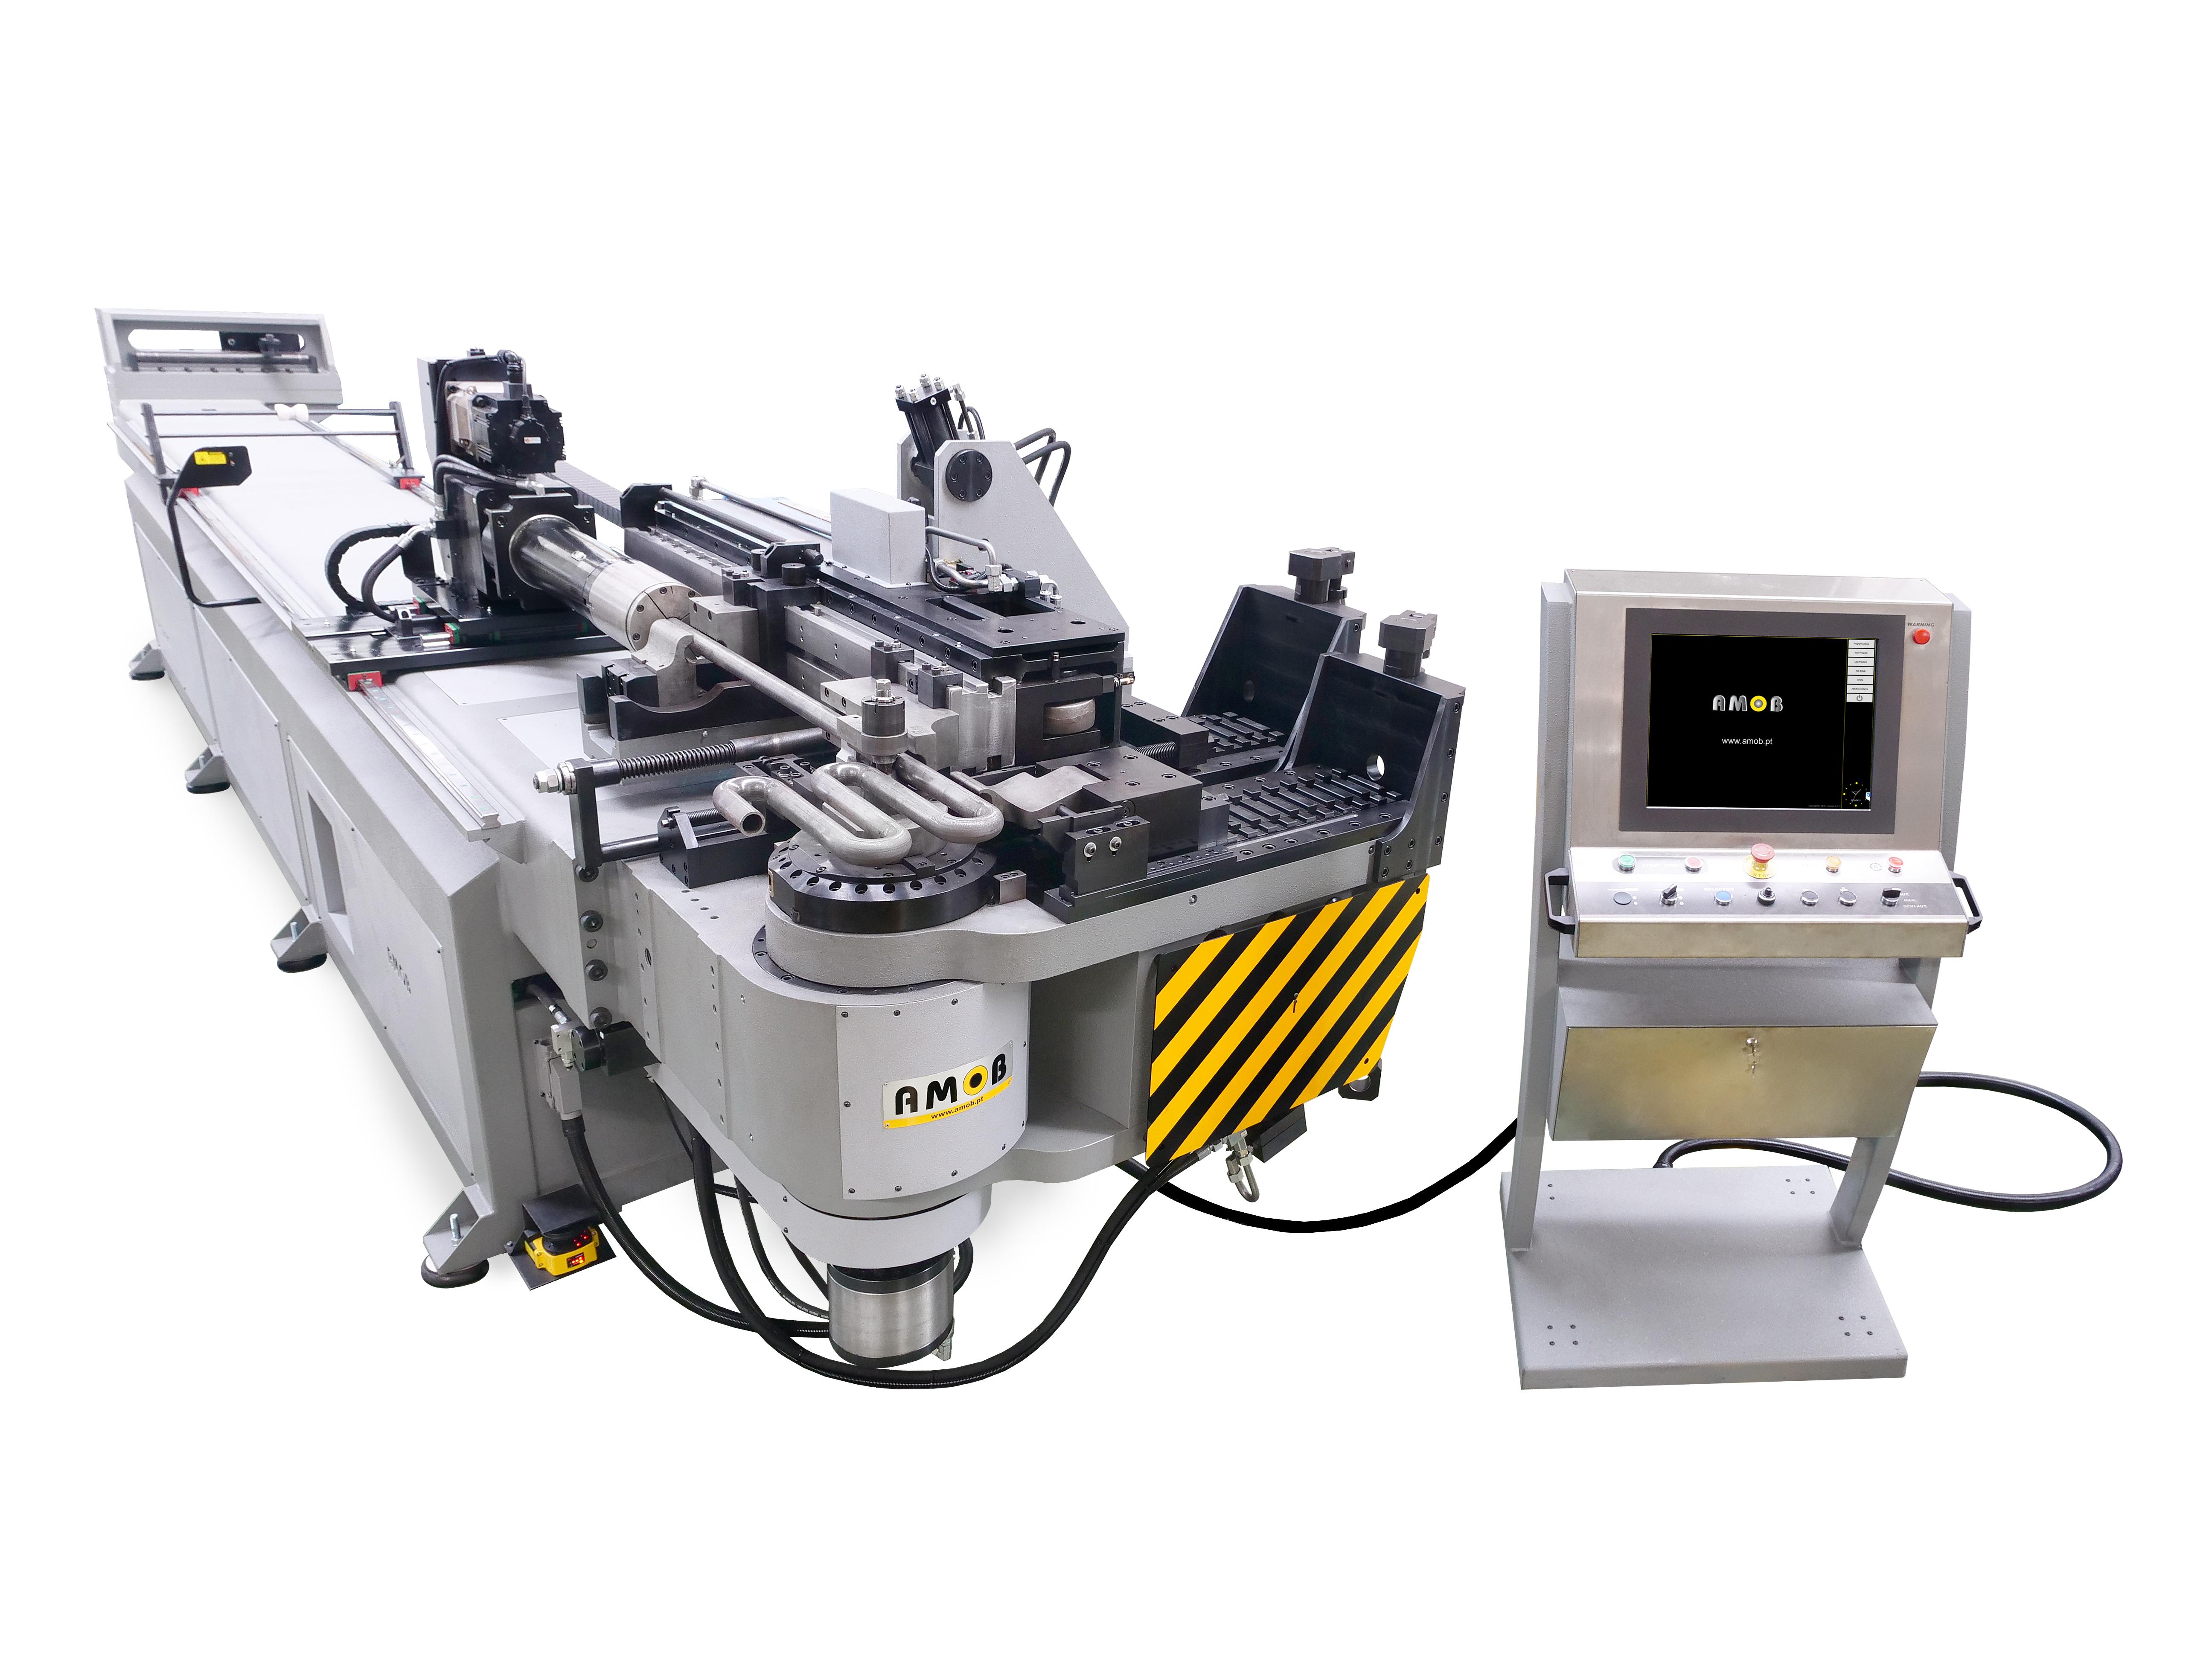 Img - CNC tube benders CH120